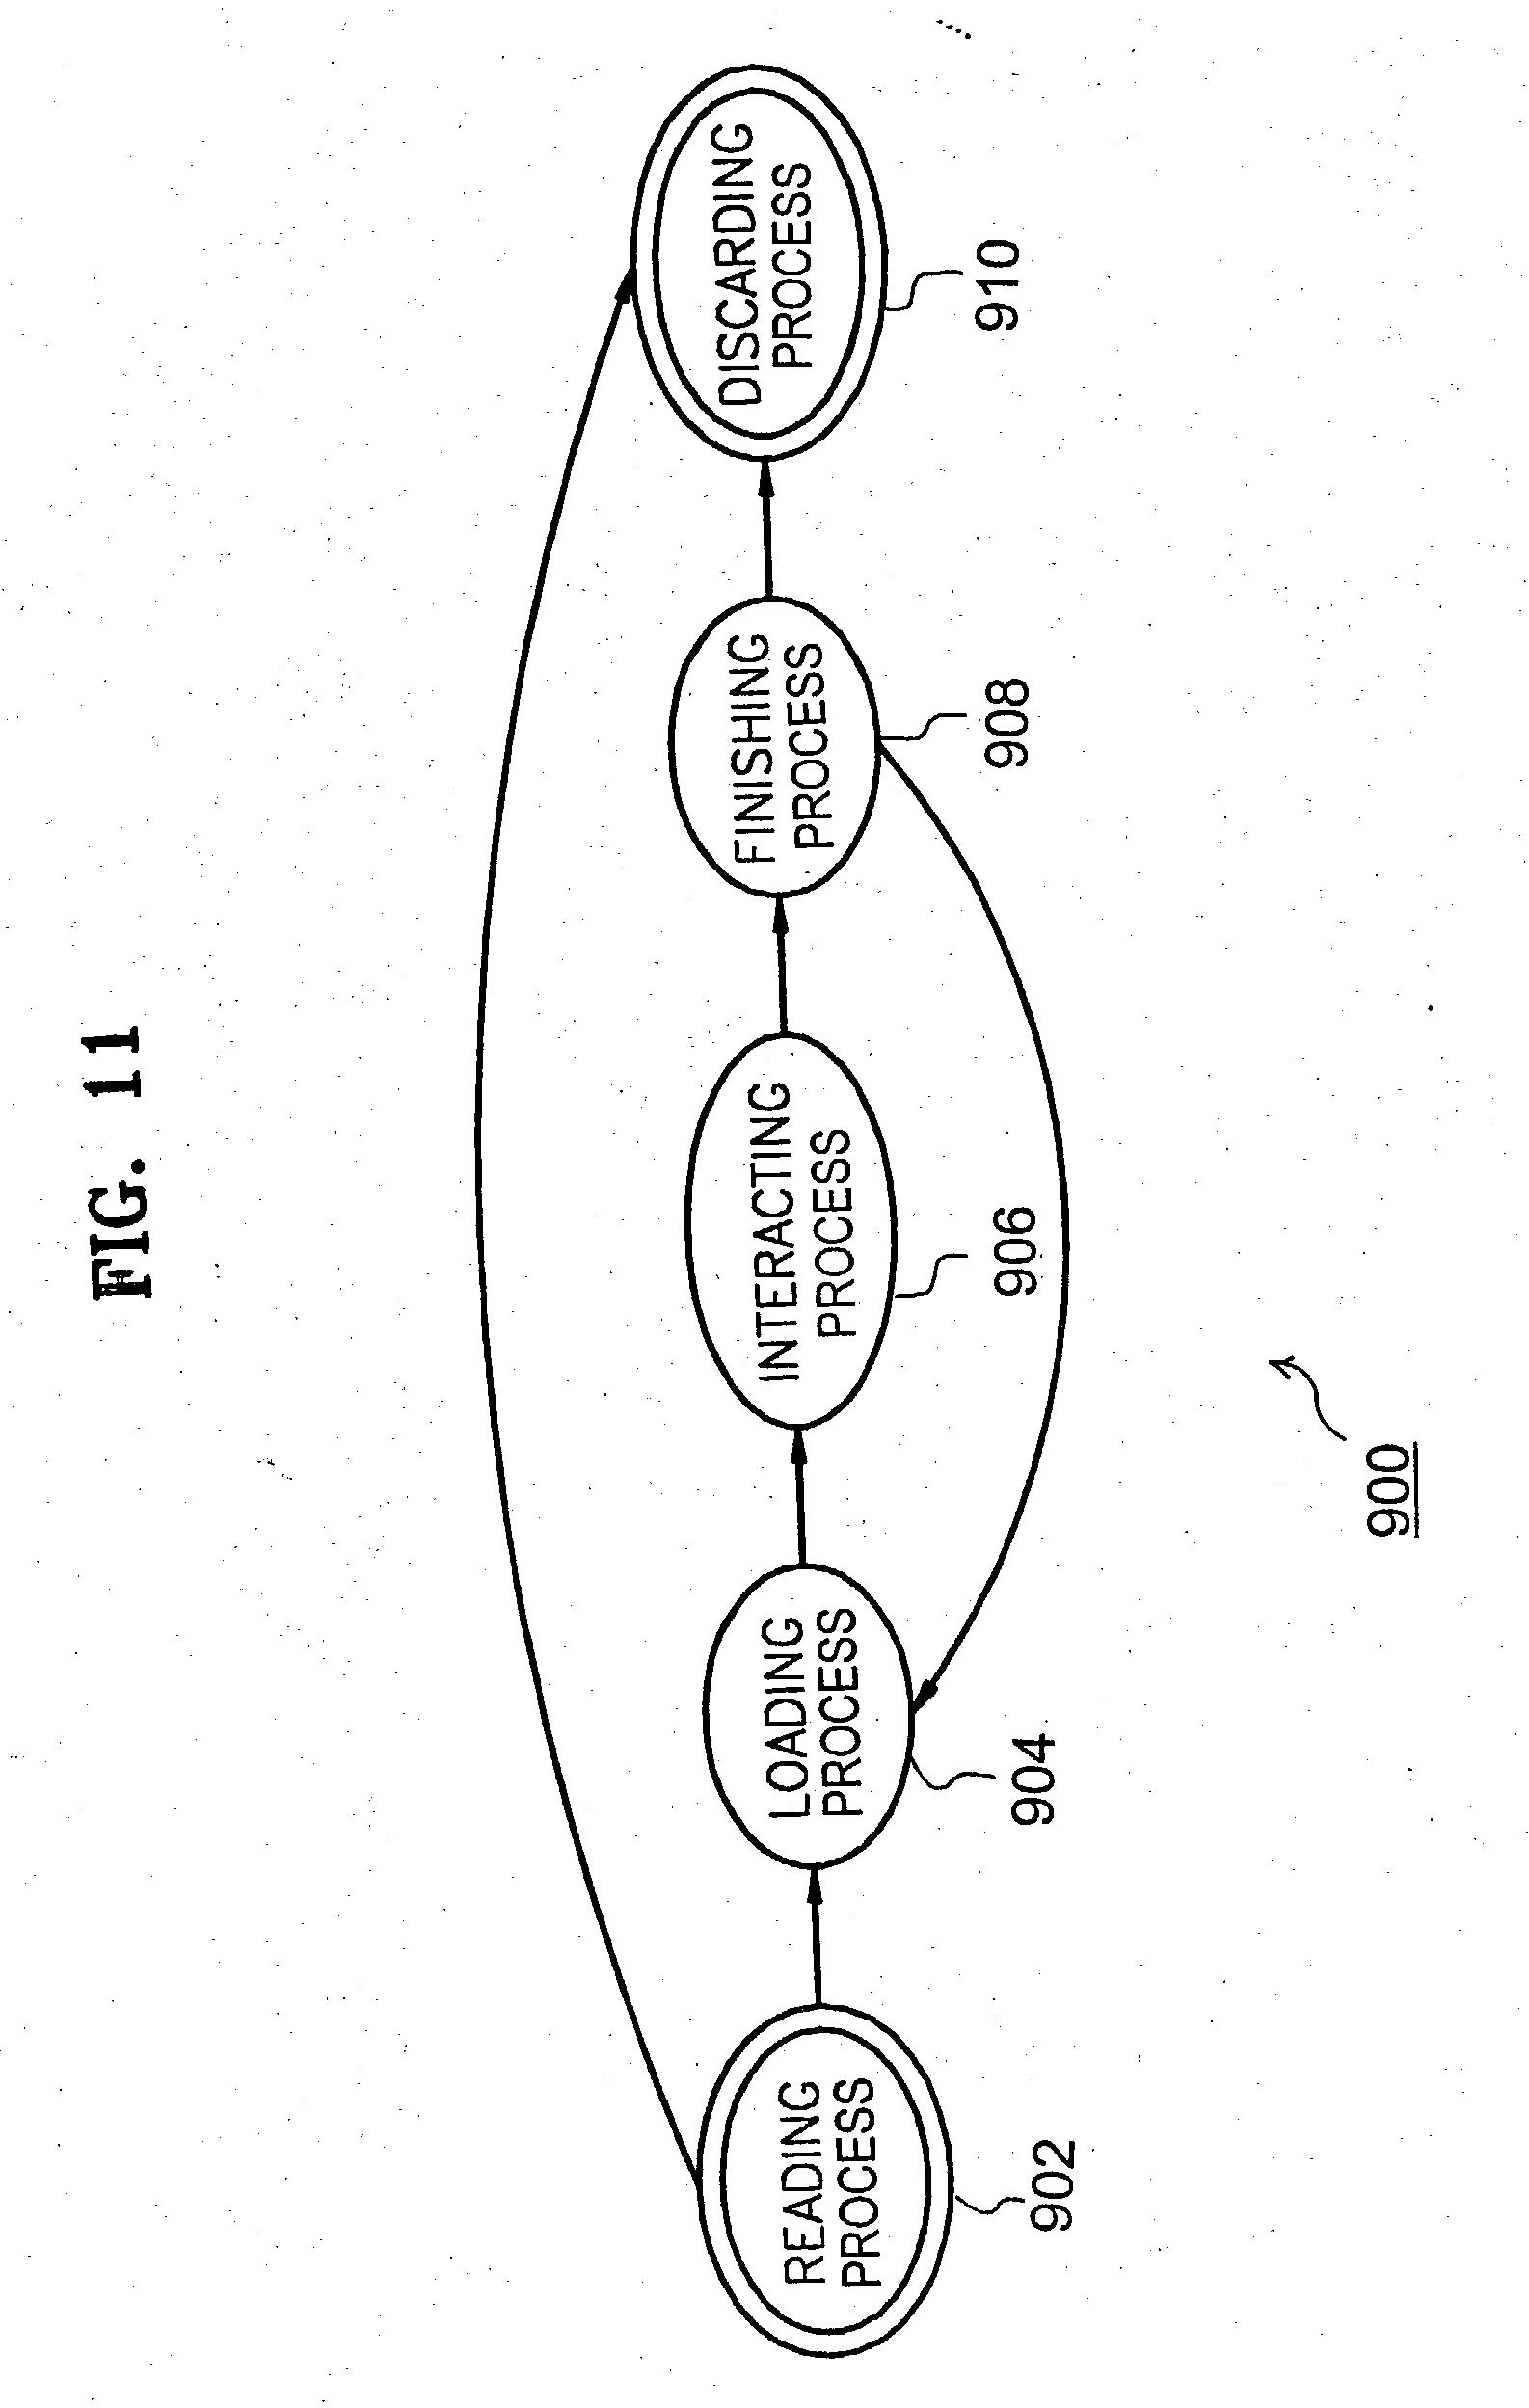 patente us20030182627